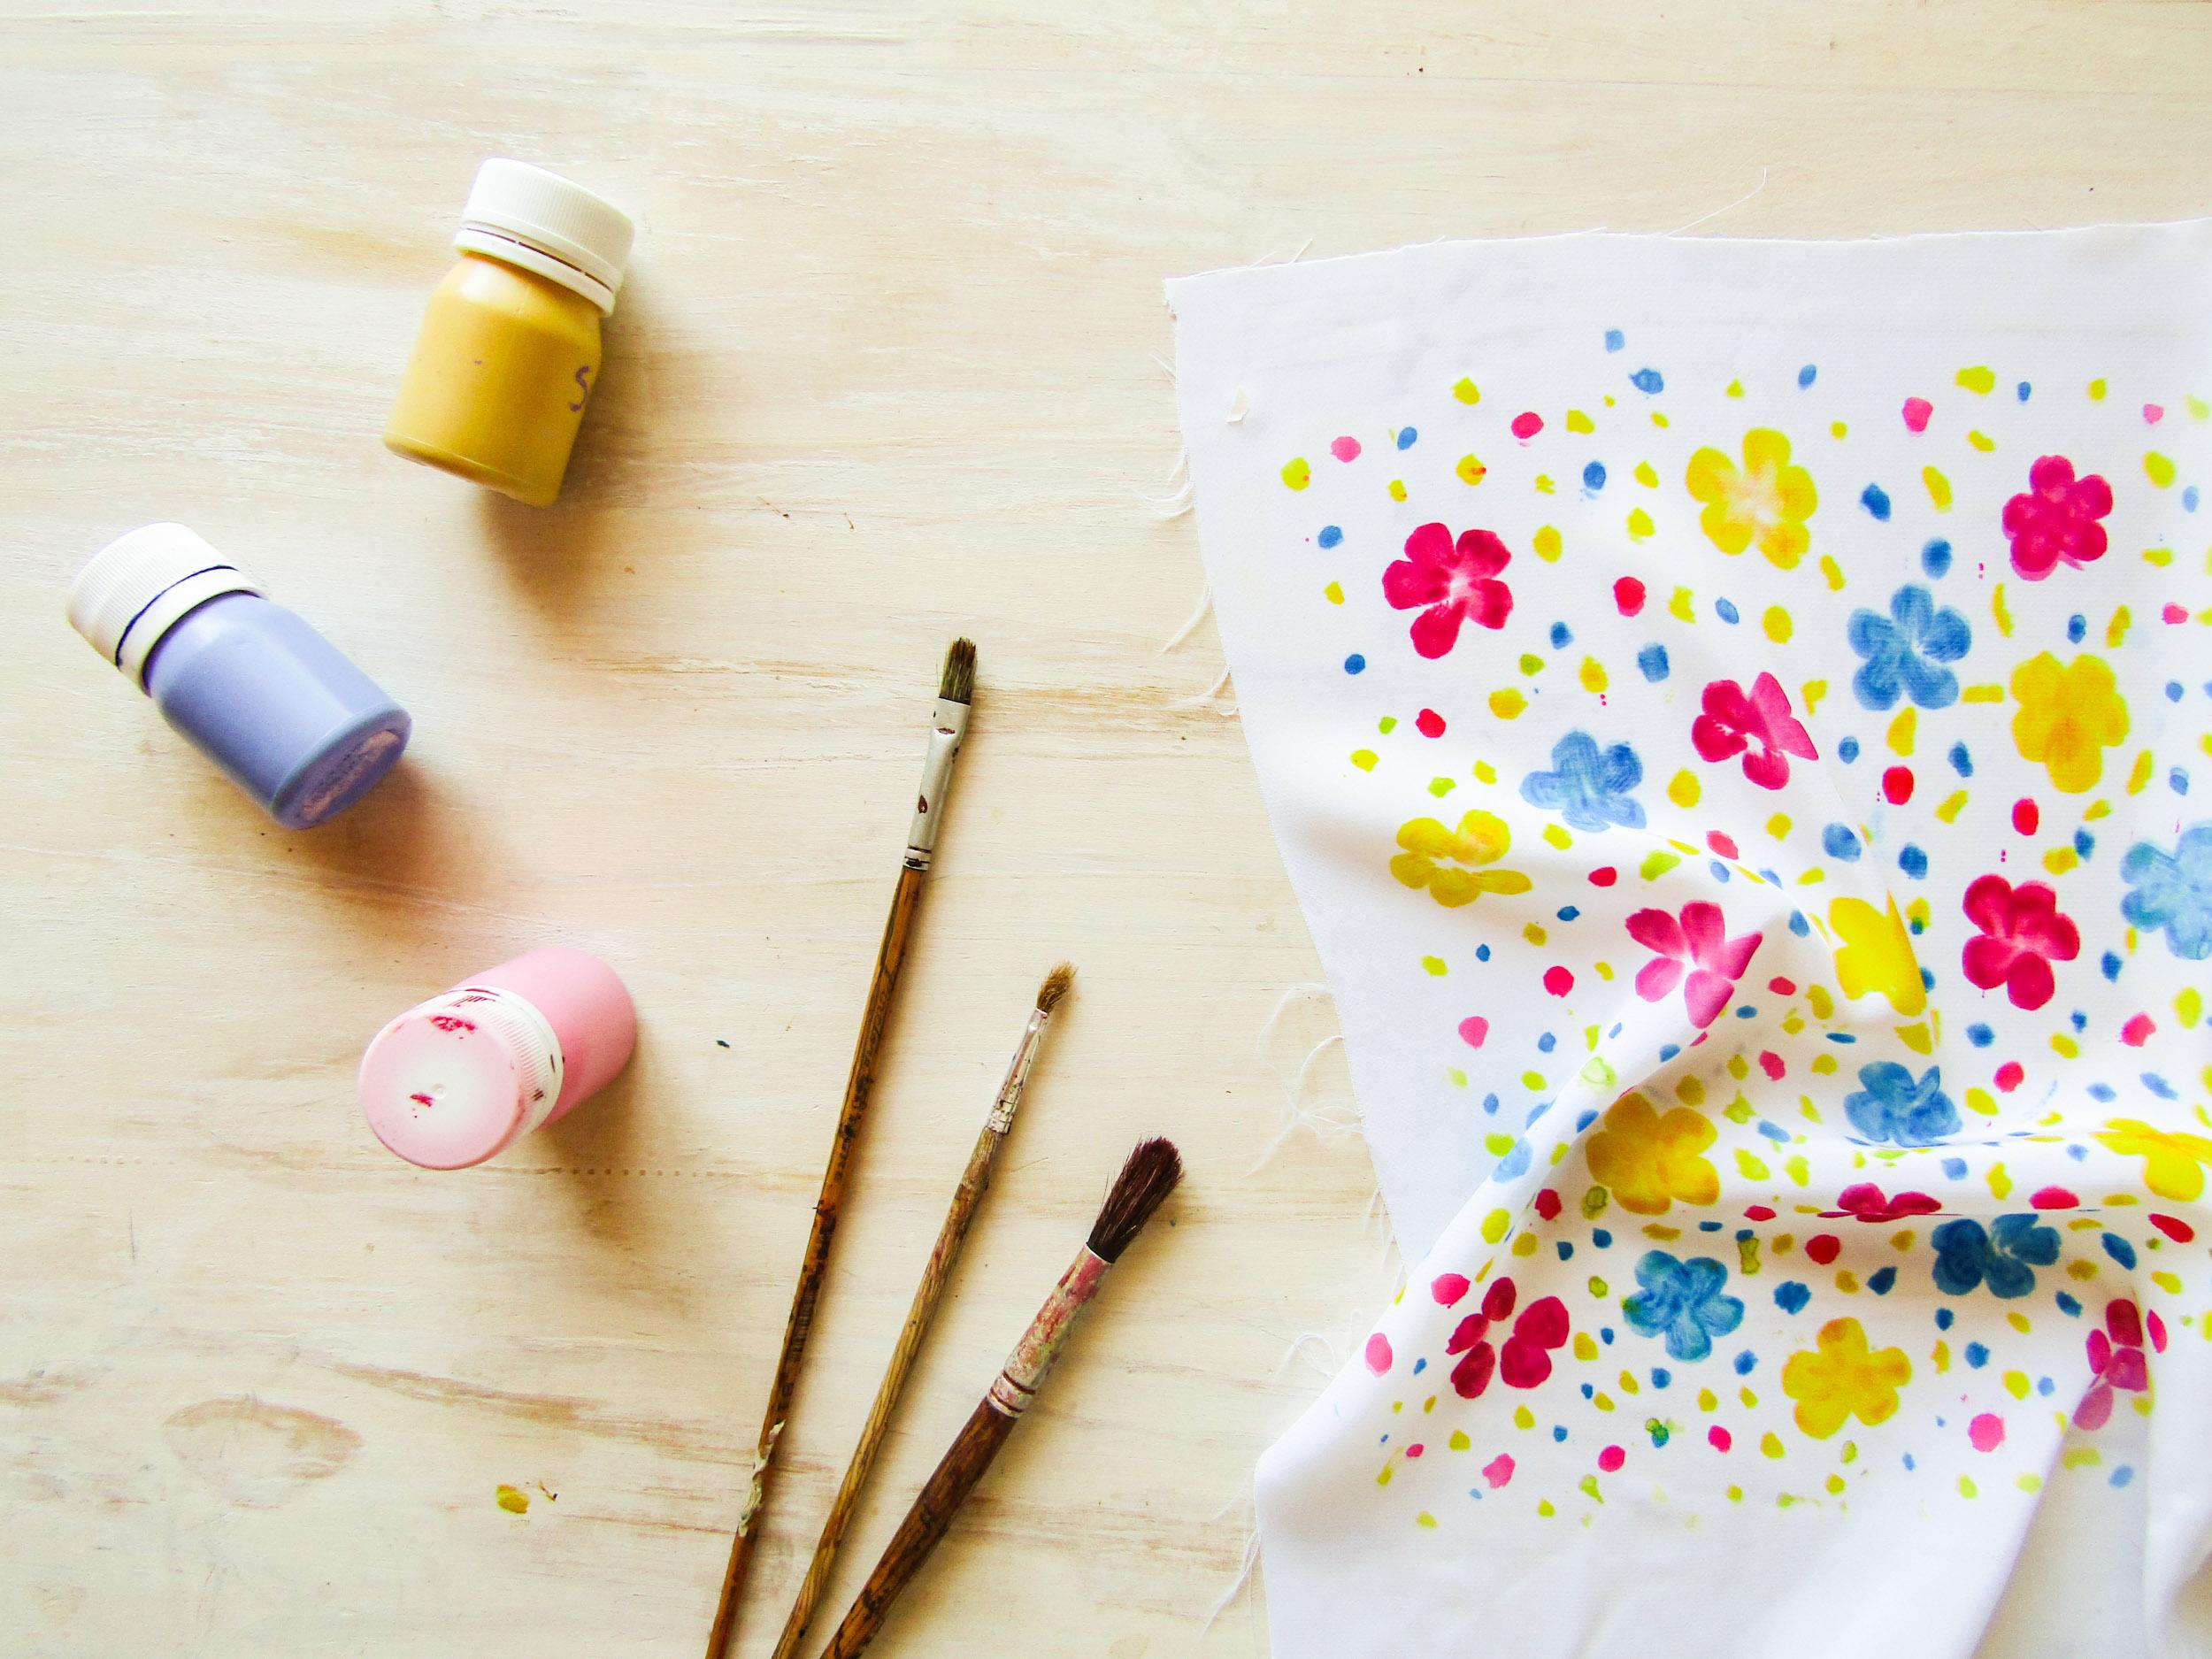 Estampa con motivo floral sobre tela